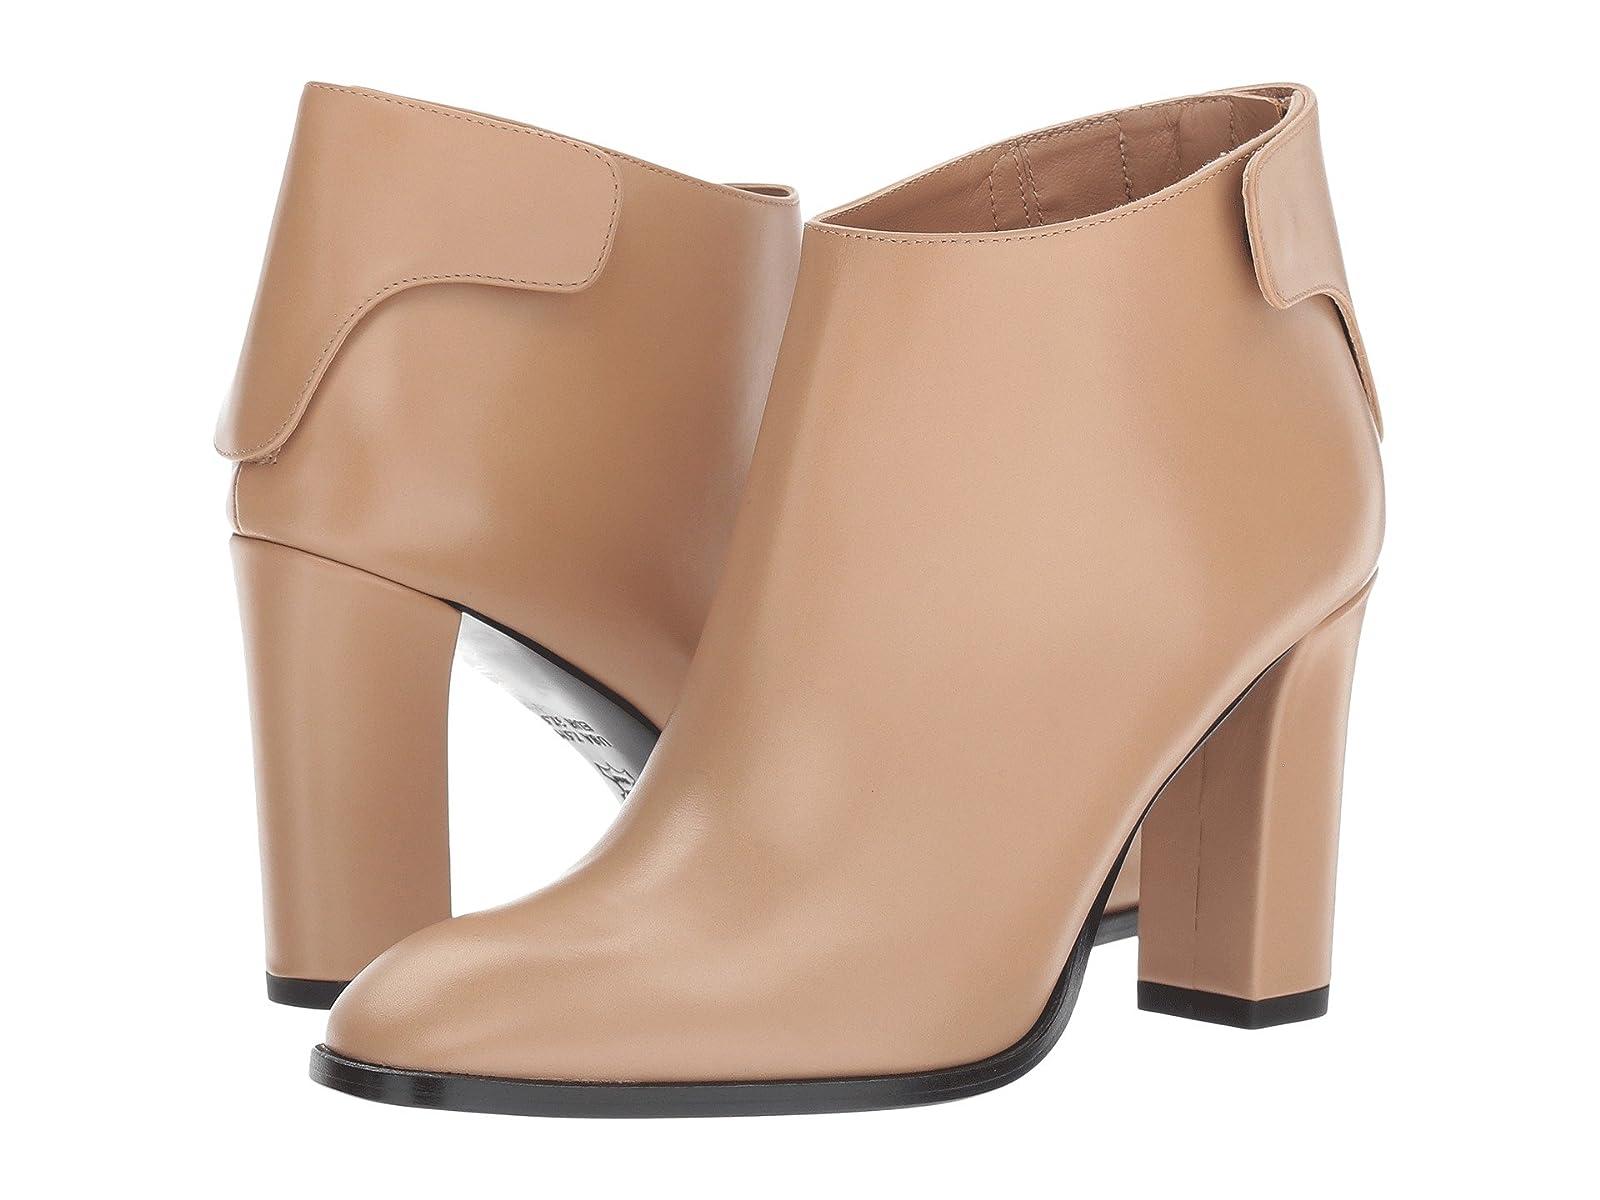 Via Spiga AstonCheap and distinctive eye-catching shoes